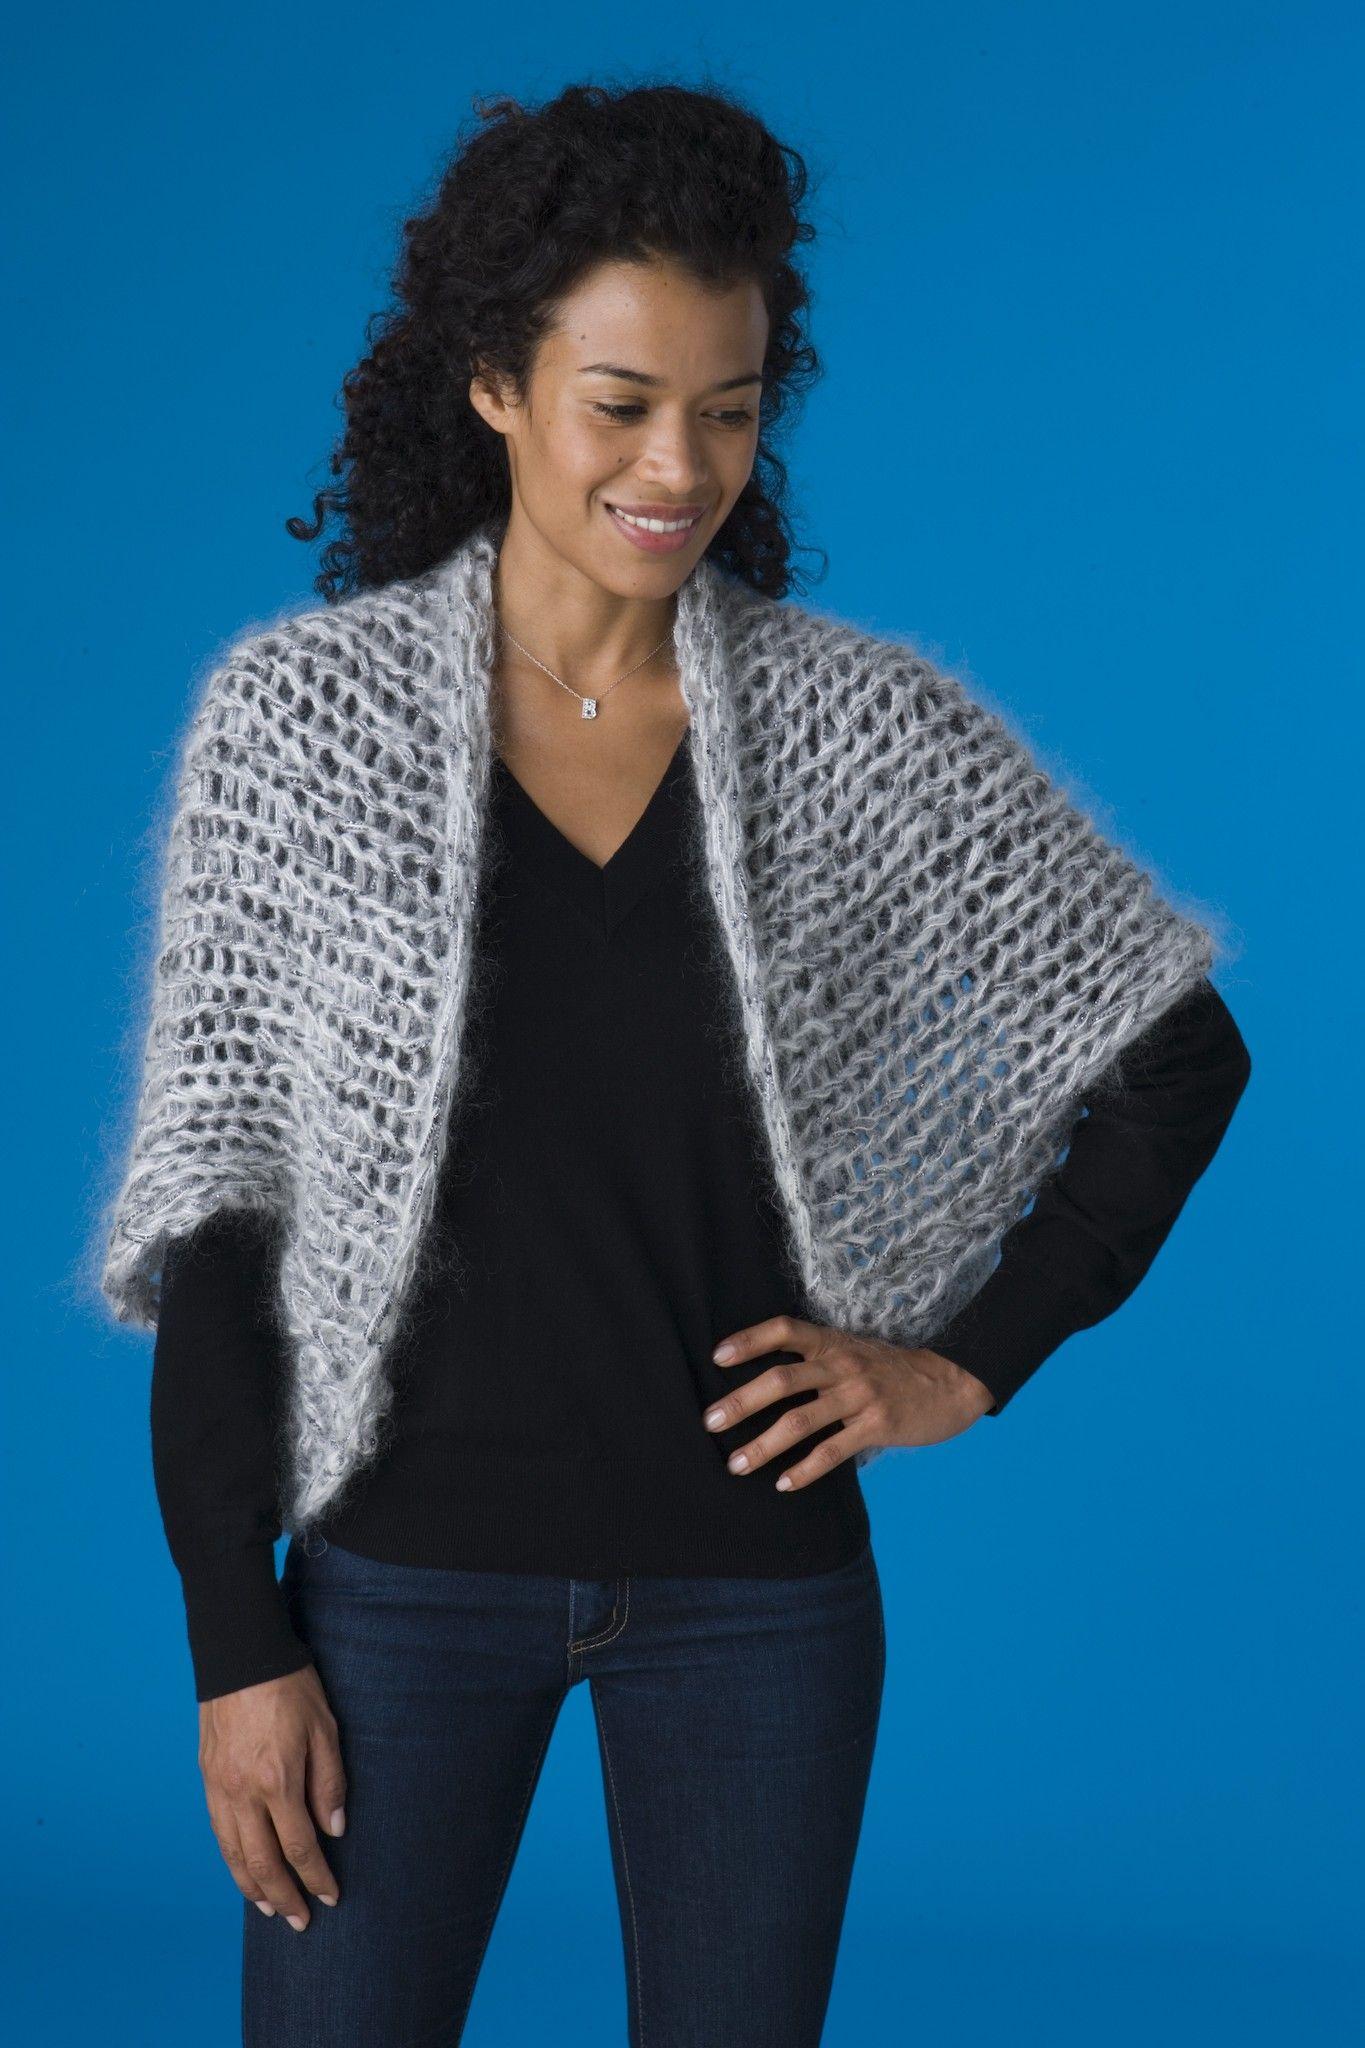 Cocoon Shrug (Knit) - Patterns - Lion Brand Yarn | shrugs ...